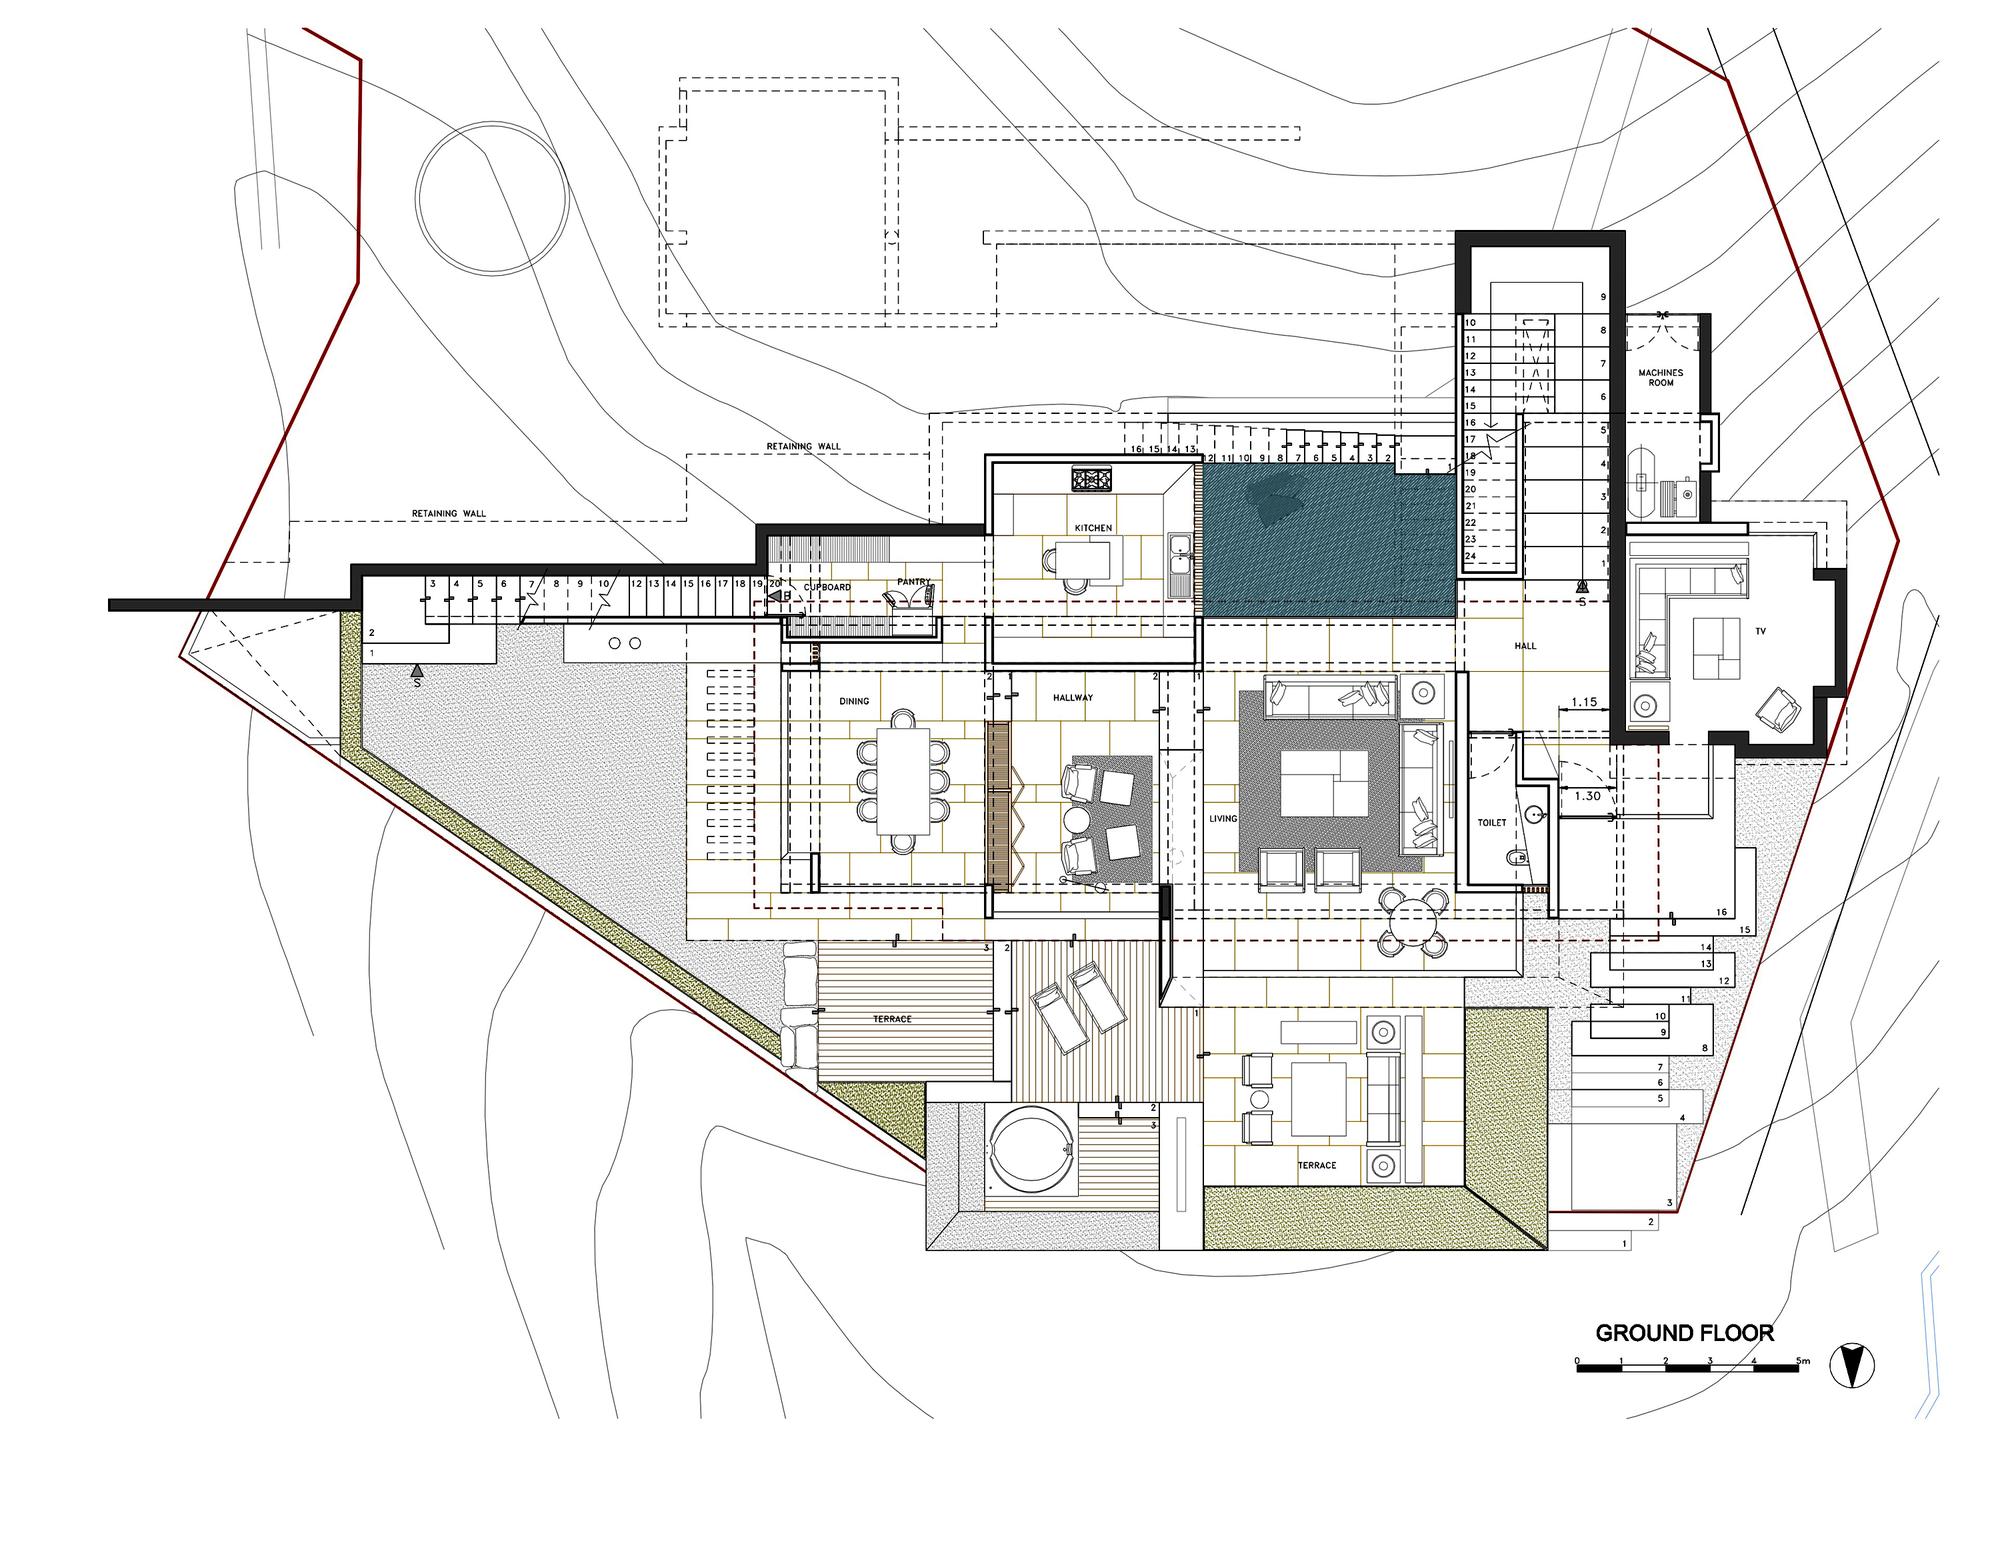 530eba91c07a802c76000128_house-maza-chk-arquitectura_ground_floor